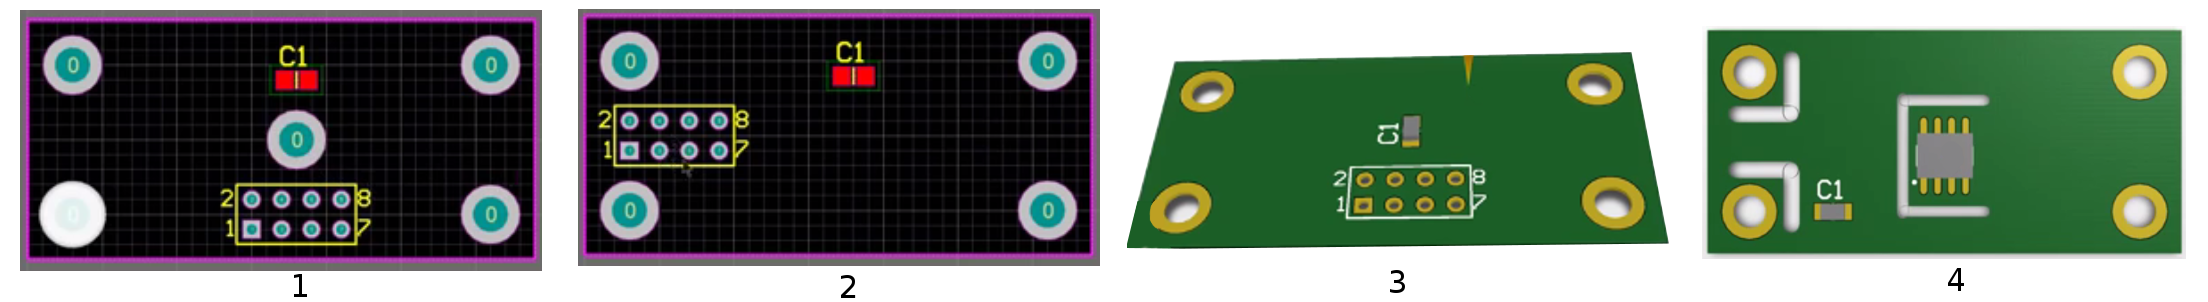 Capacitor placment PCB